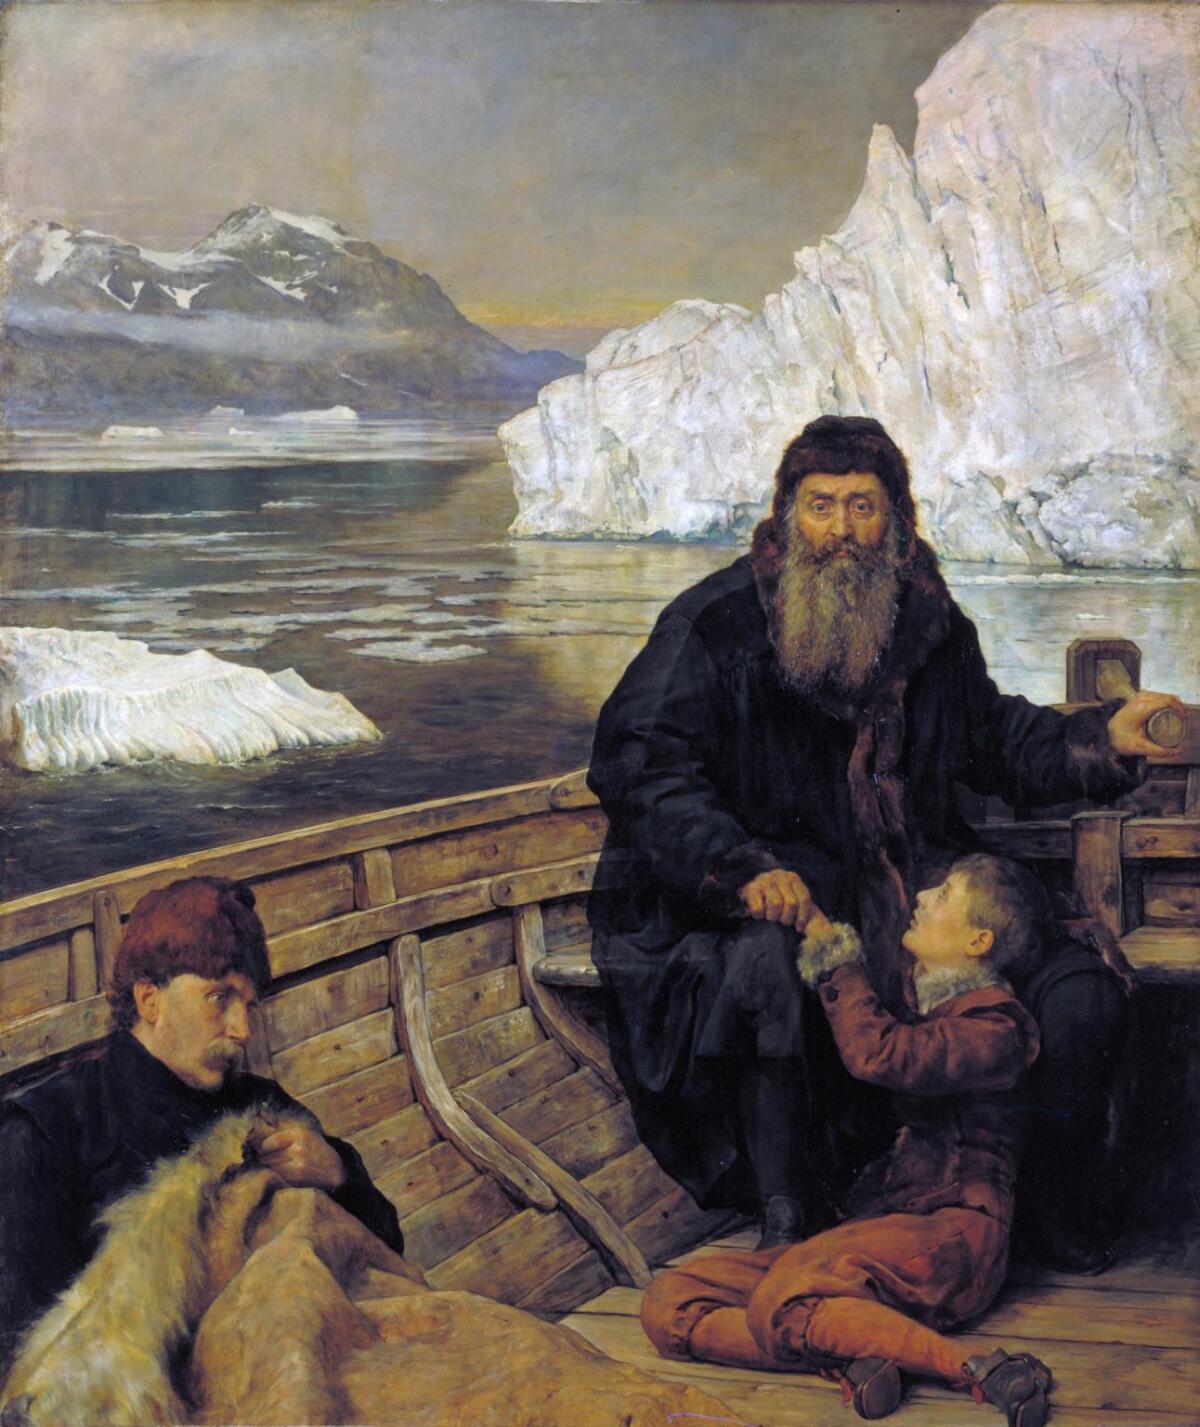 Джон Кольер, «Последнее путешествие Генри Гудзона»